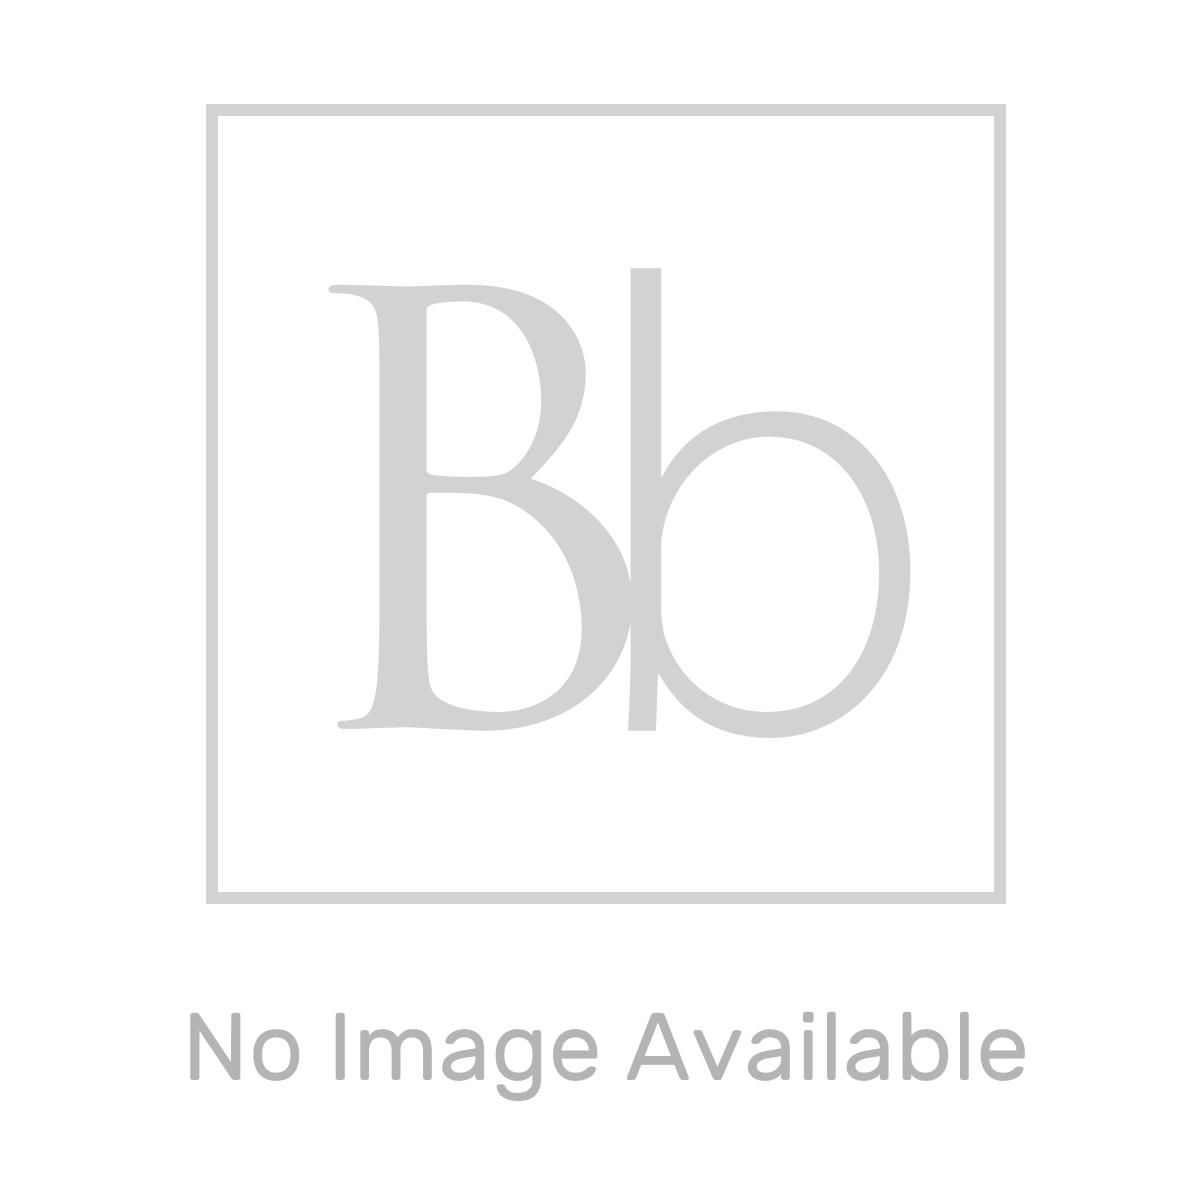 RAK Surface Matt Charcoal Black Tile 300 x 600mm Lifestyle